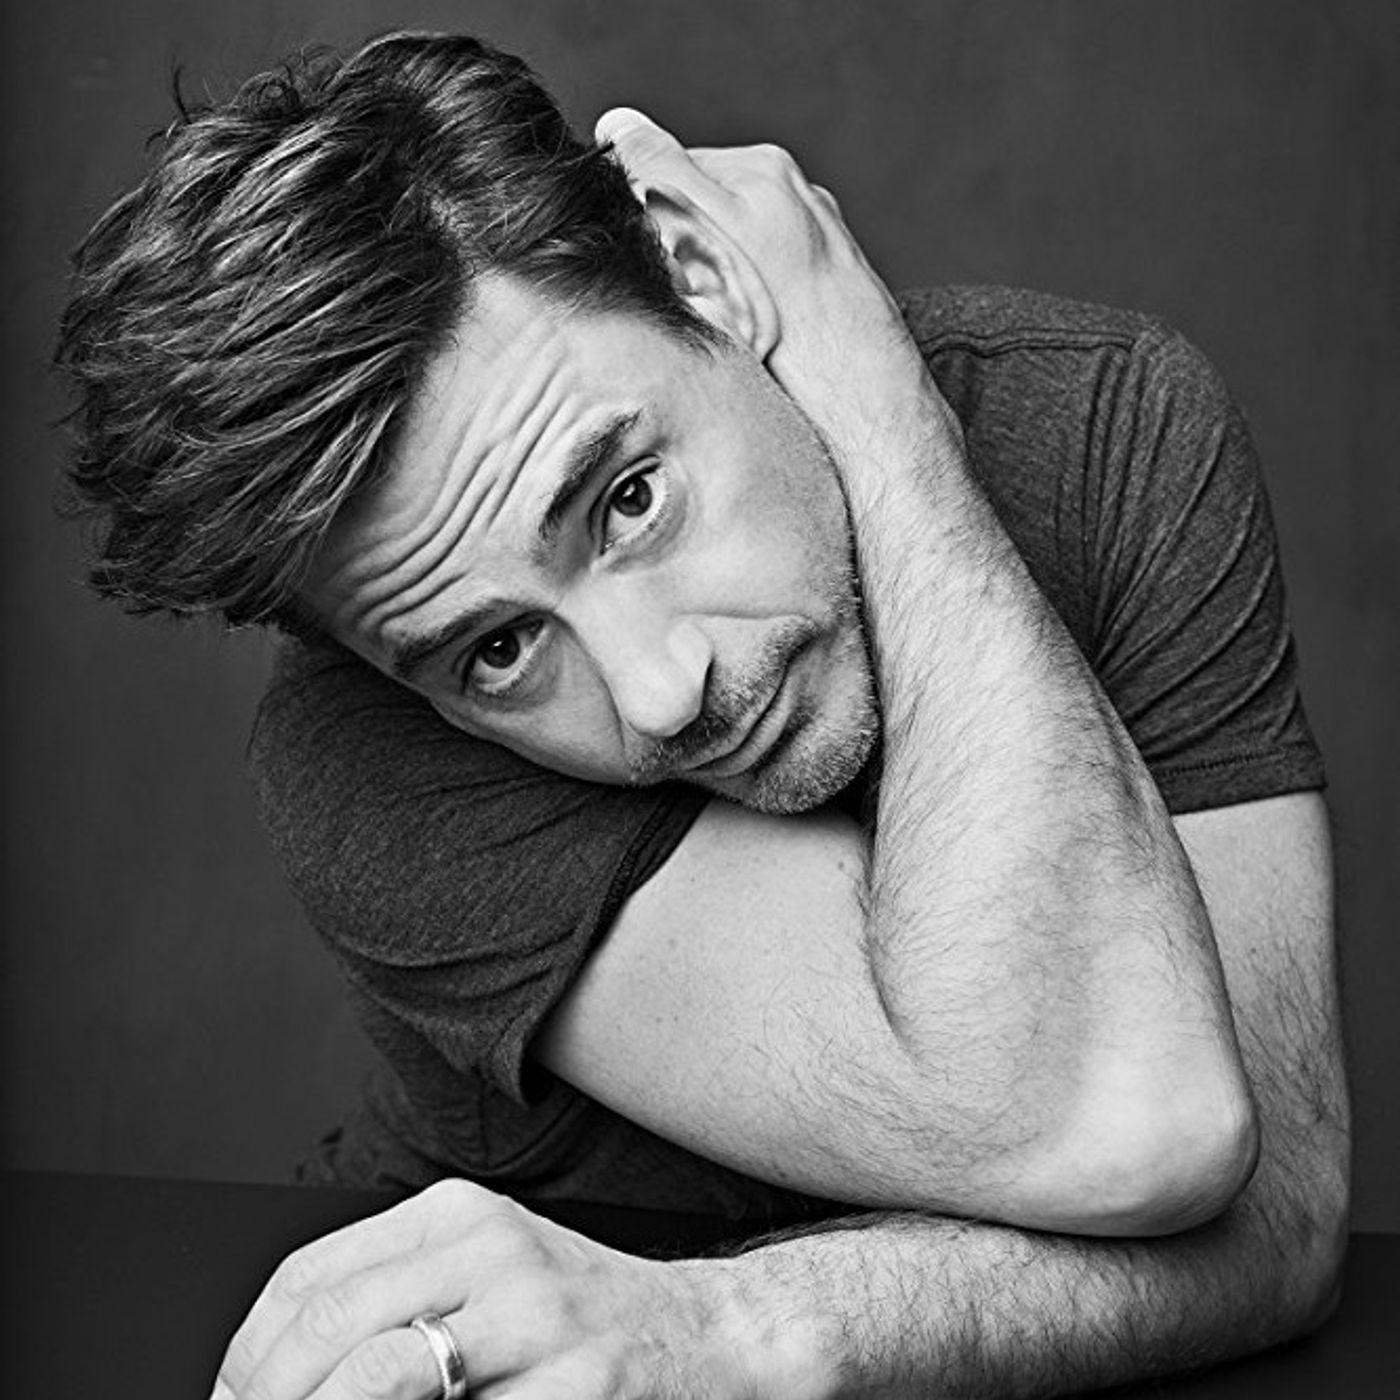 Ep 5.  Robert Downey Jr - 1